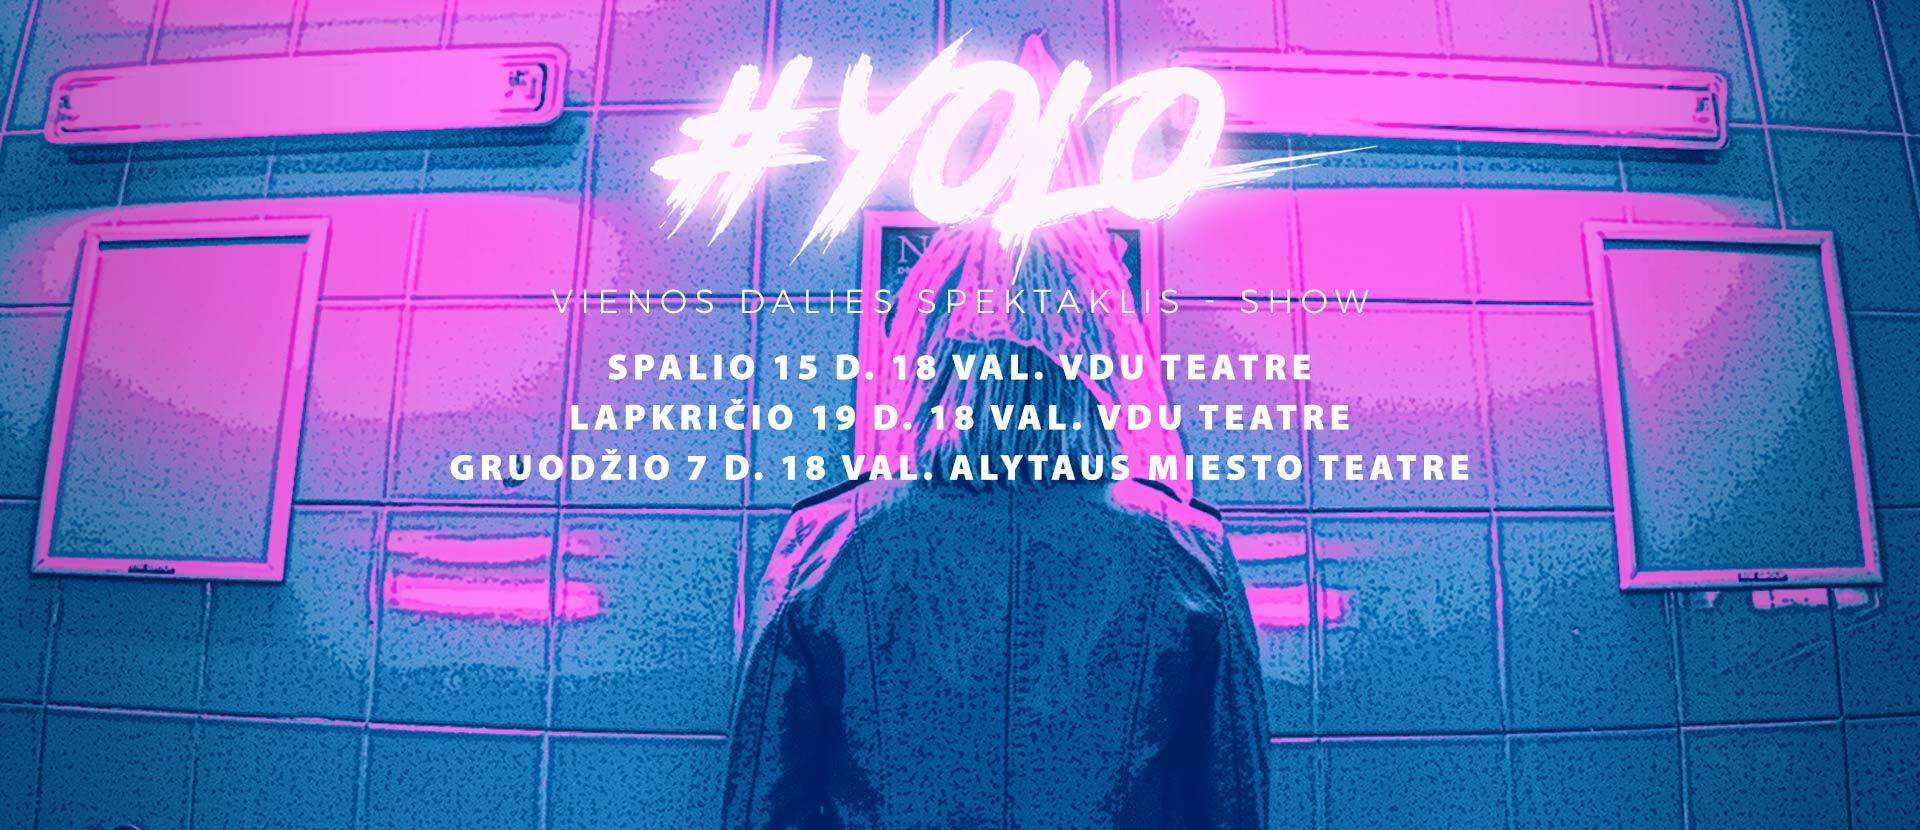 Spektaklis YOLO - vienos dalies show